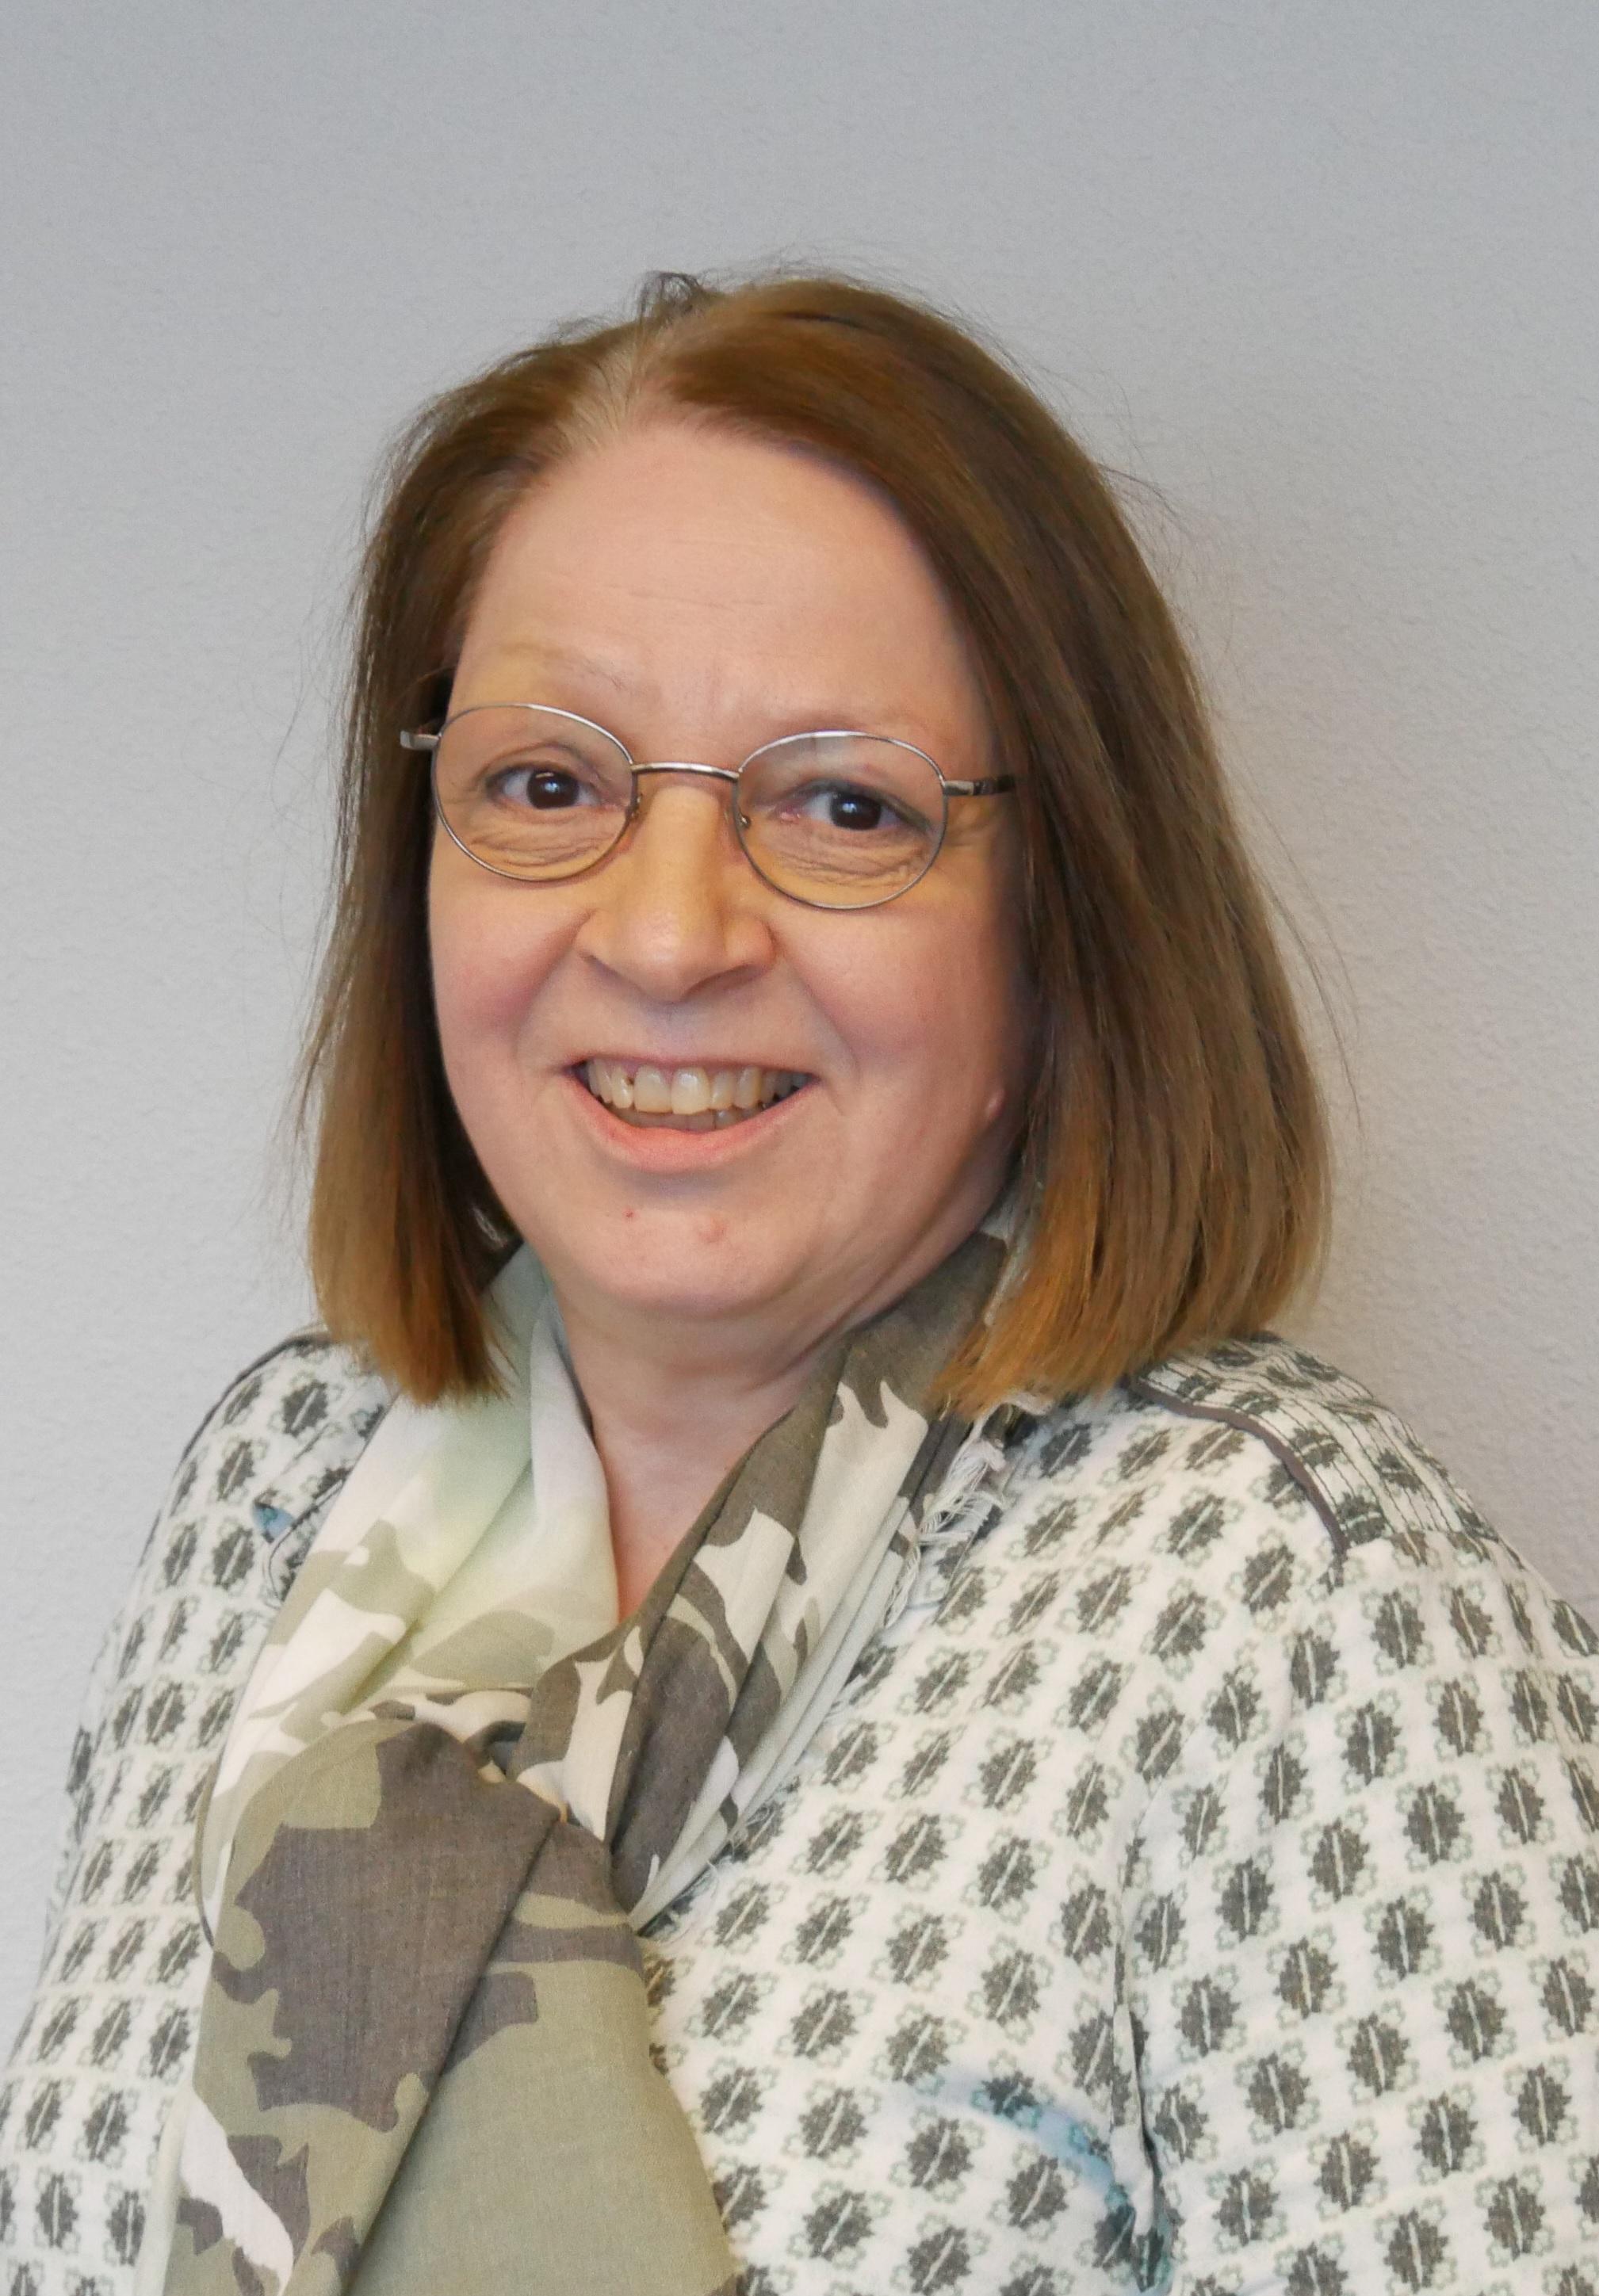 Marise van Hoofstadt